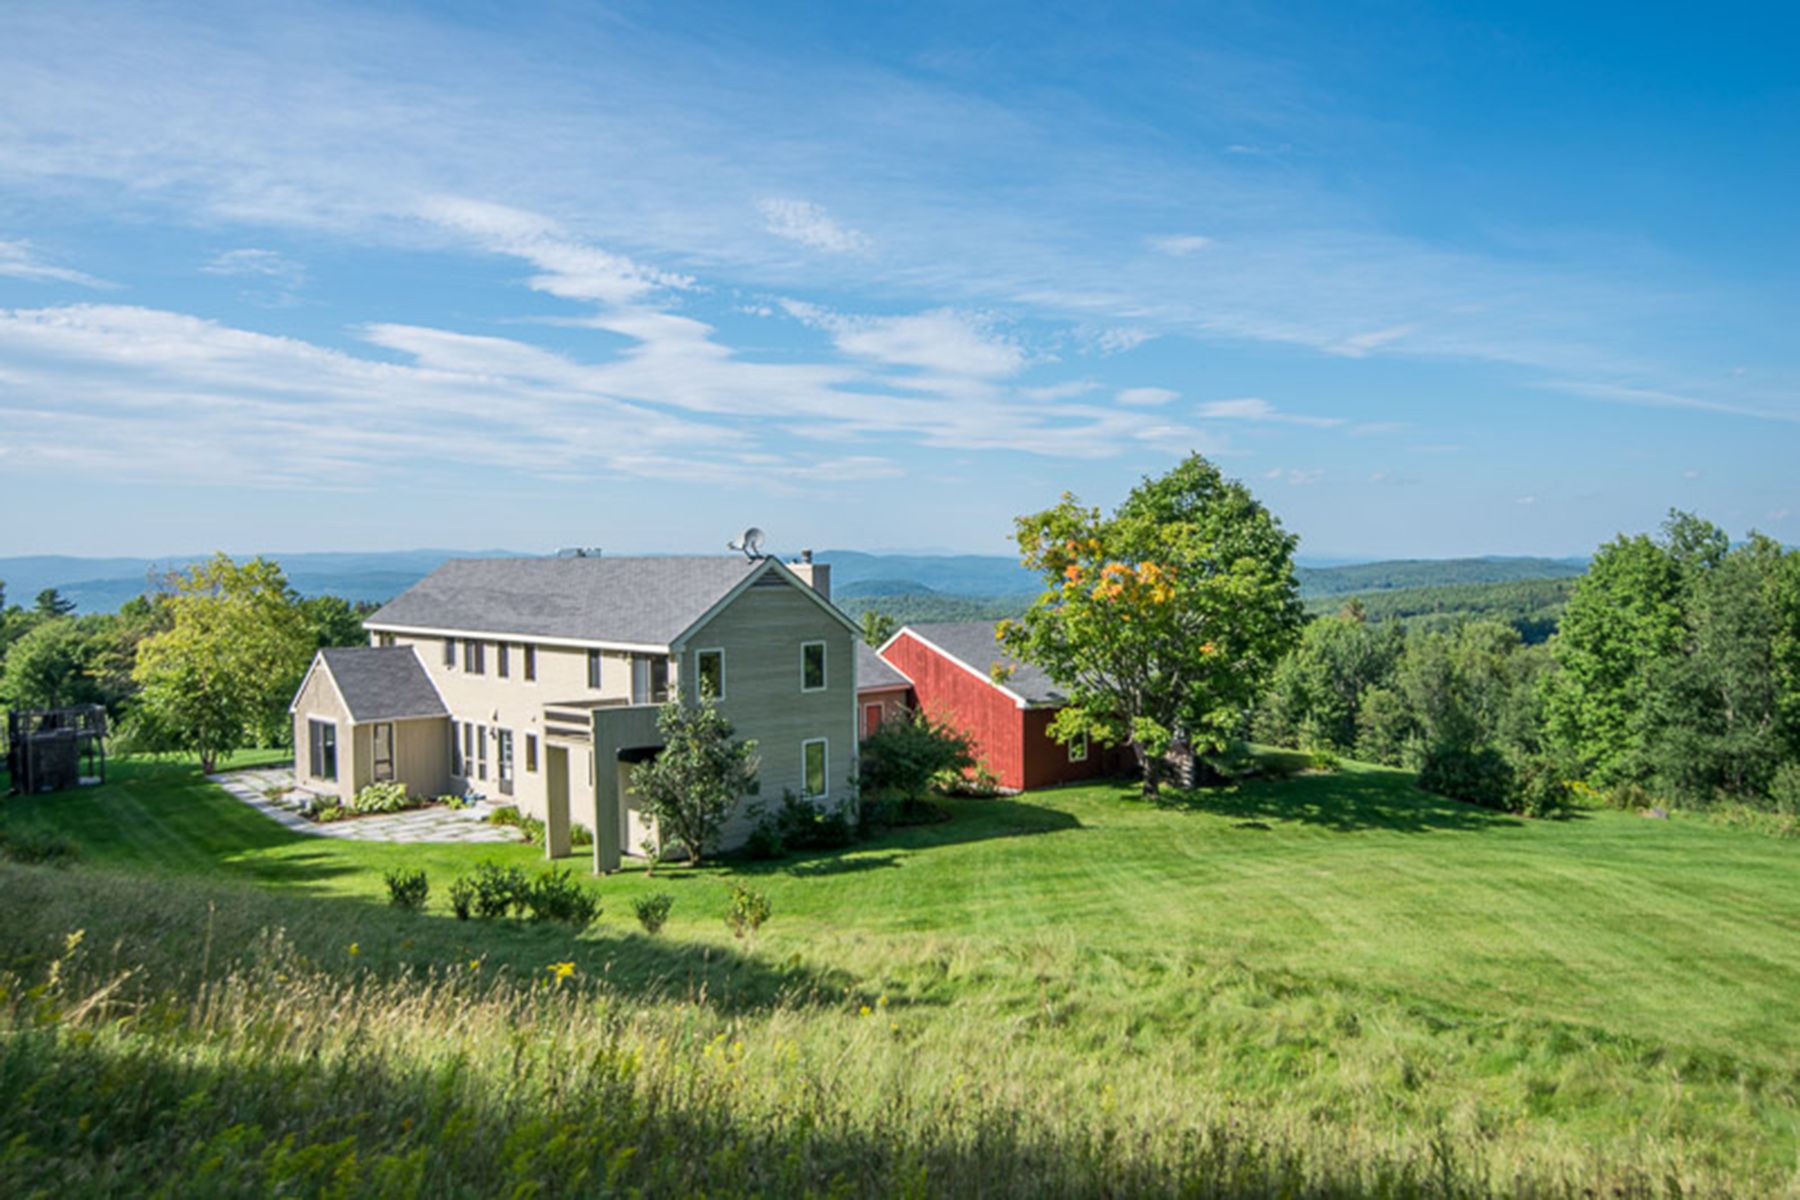 Частный односемейный дом для того Продажа на 191 Three Mile Rd, Hanover Hanover, Нью-Гэмпшир 03755 Соединенные Штаты